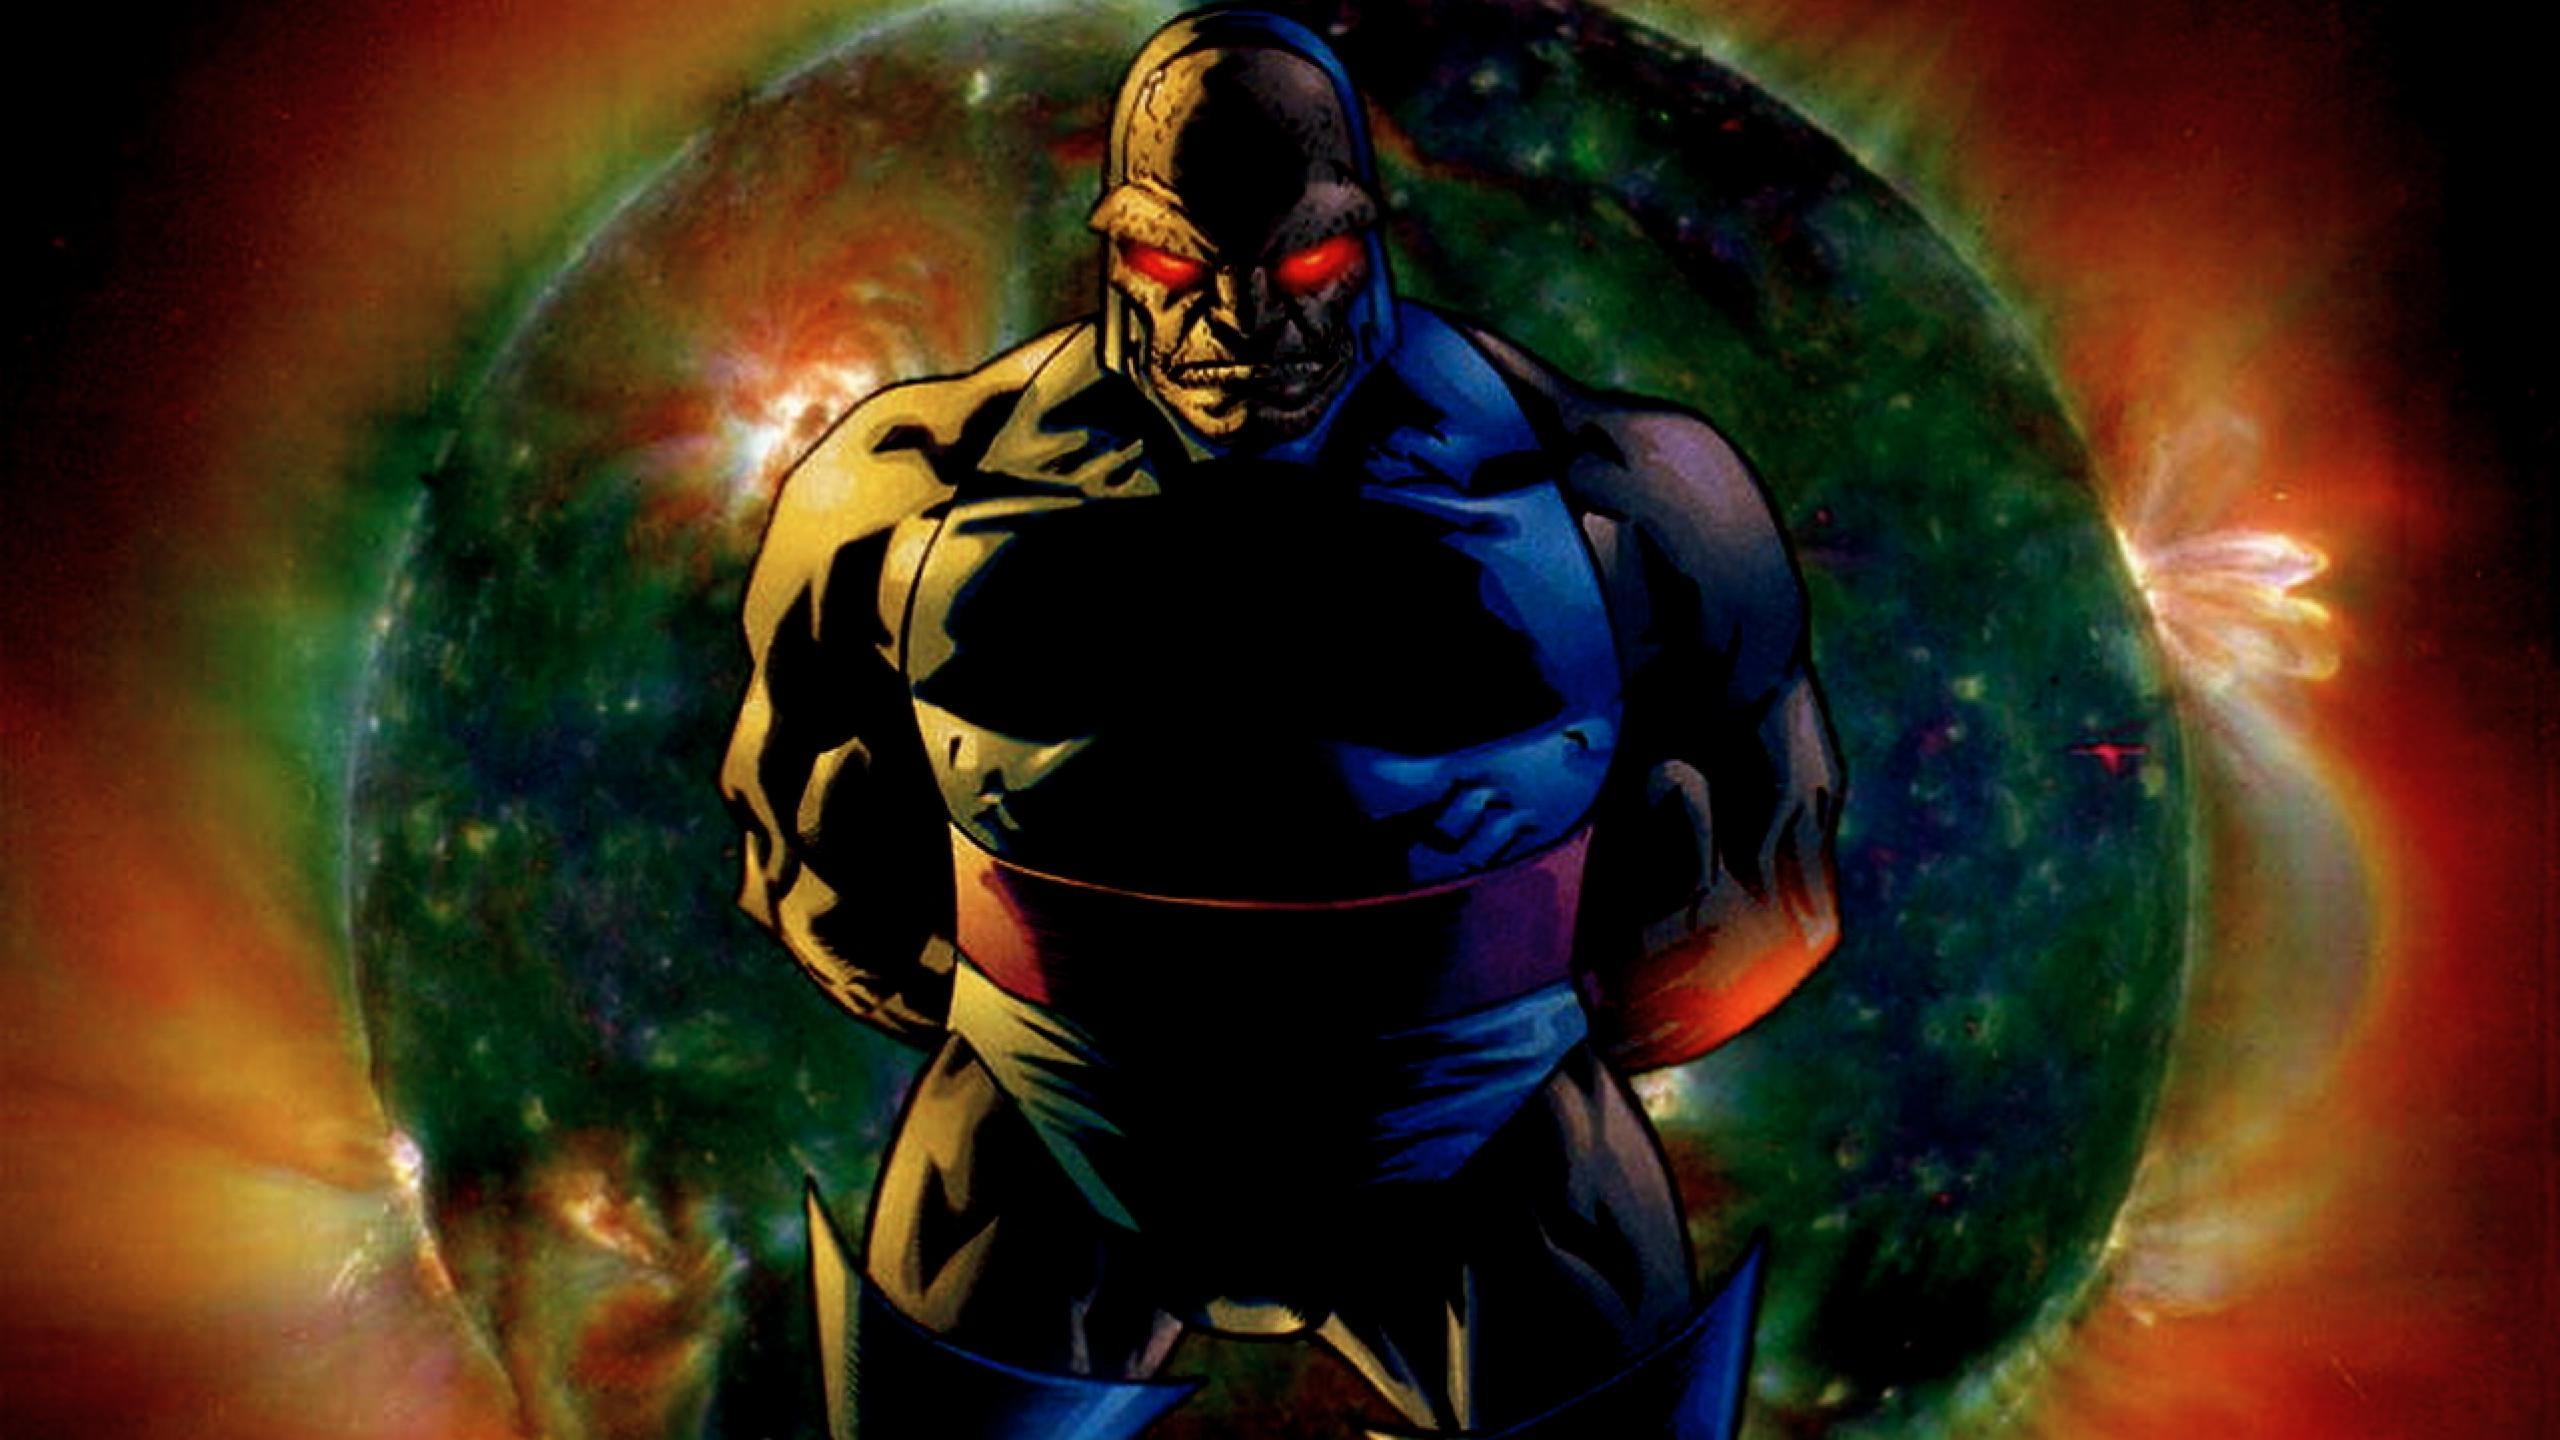 dc comics darkseid HD Wallpaper – Cartoon & Animation (#517308)